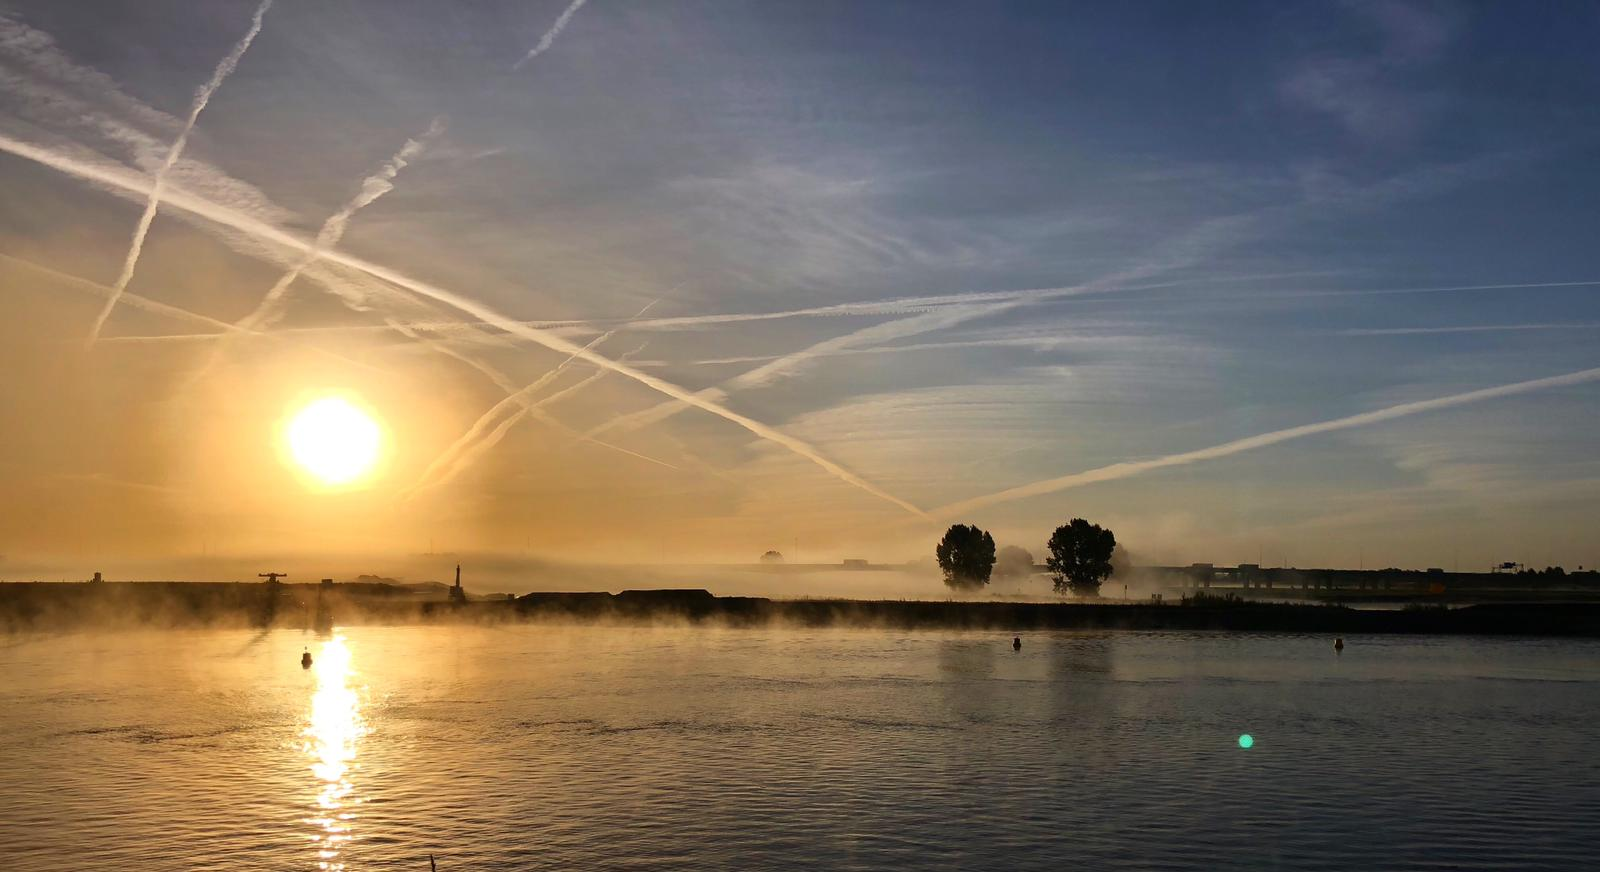 Vreeswijk Lek zonsopgang